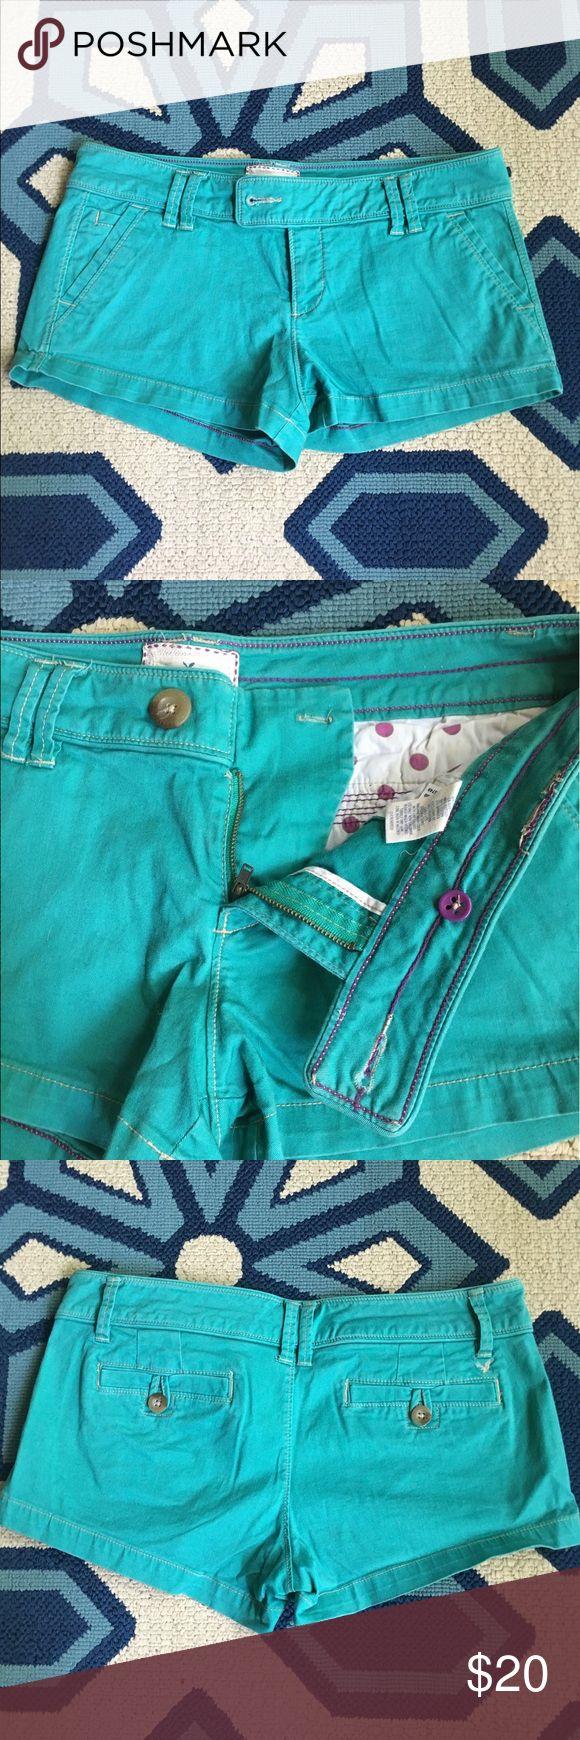 AMERICAN EAGLE 💕 teal shorts Adorable American Eagle shorts. Size 8. Great condition! 😘 American Eagle Outfitters Shorts